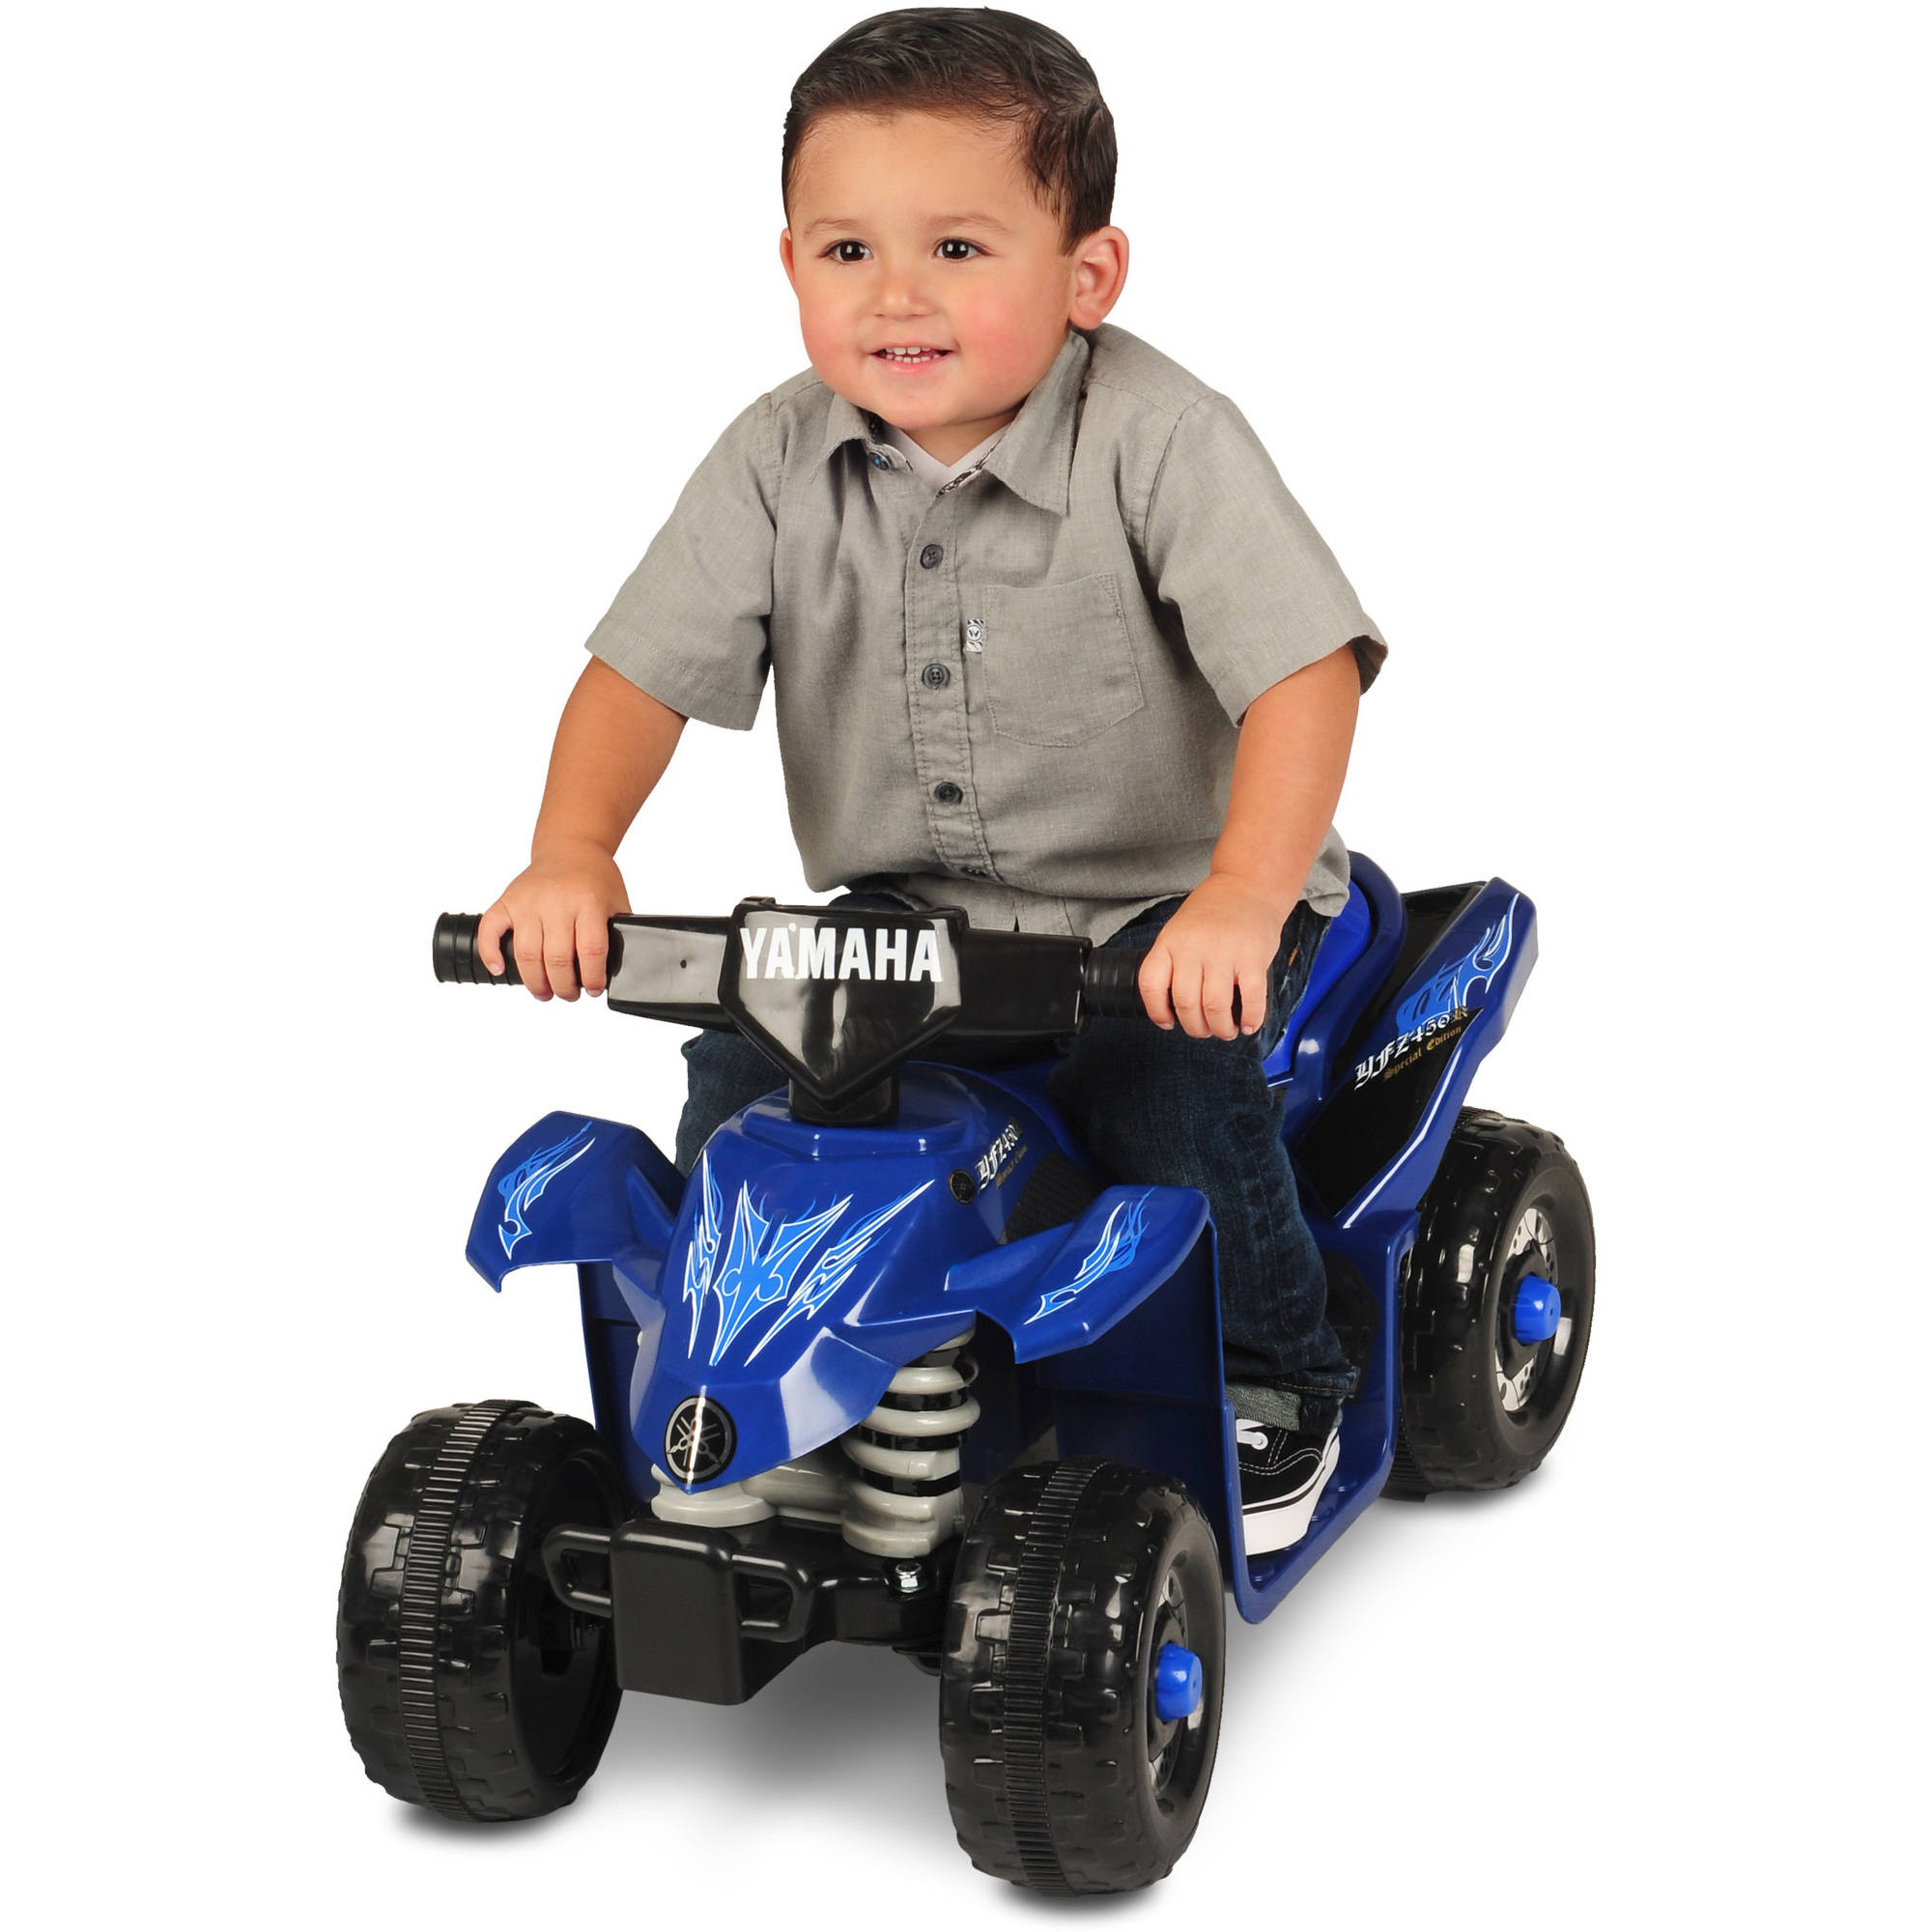 Yamaha ATV 6-Volt Battery-Powered Ride-On - Walmart.com